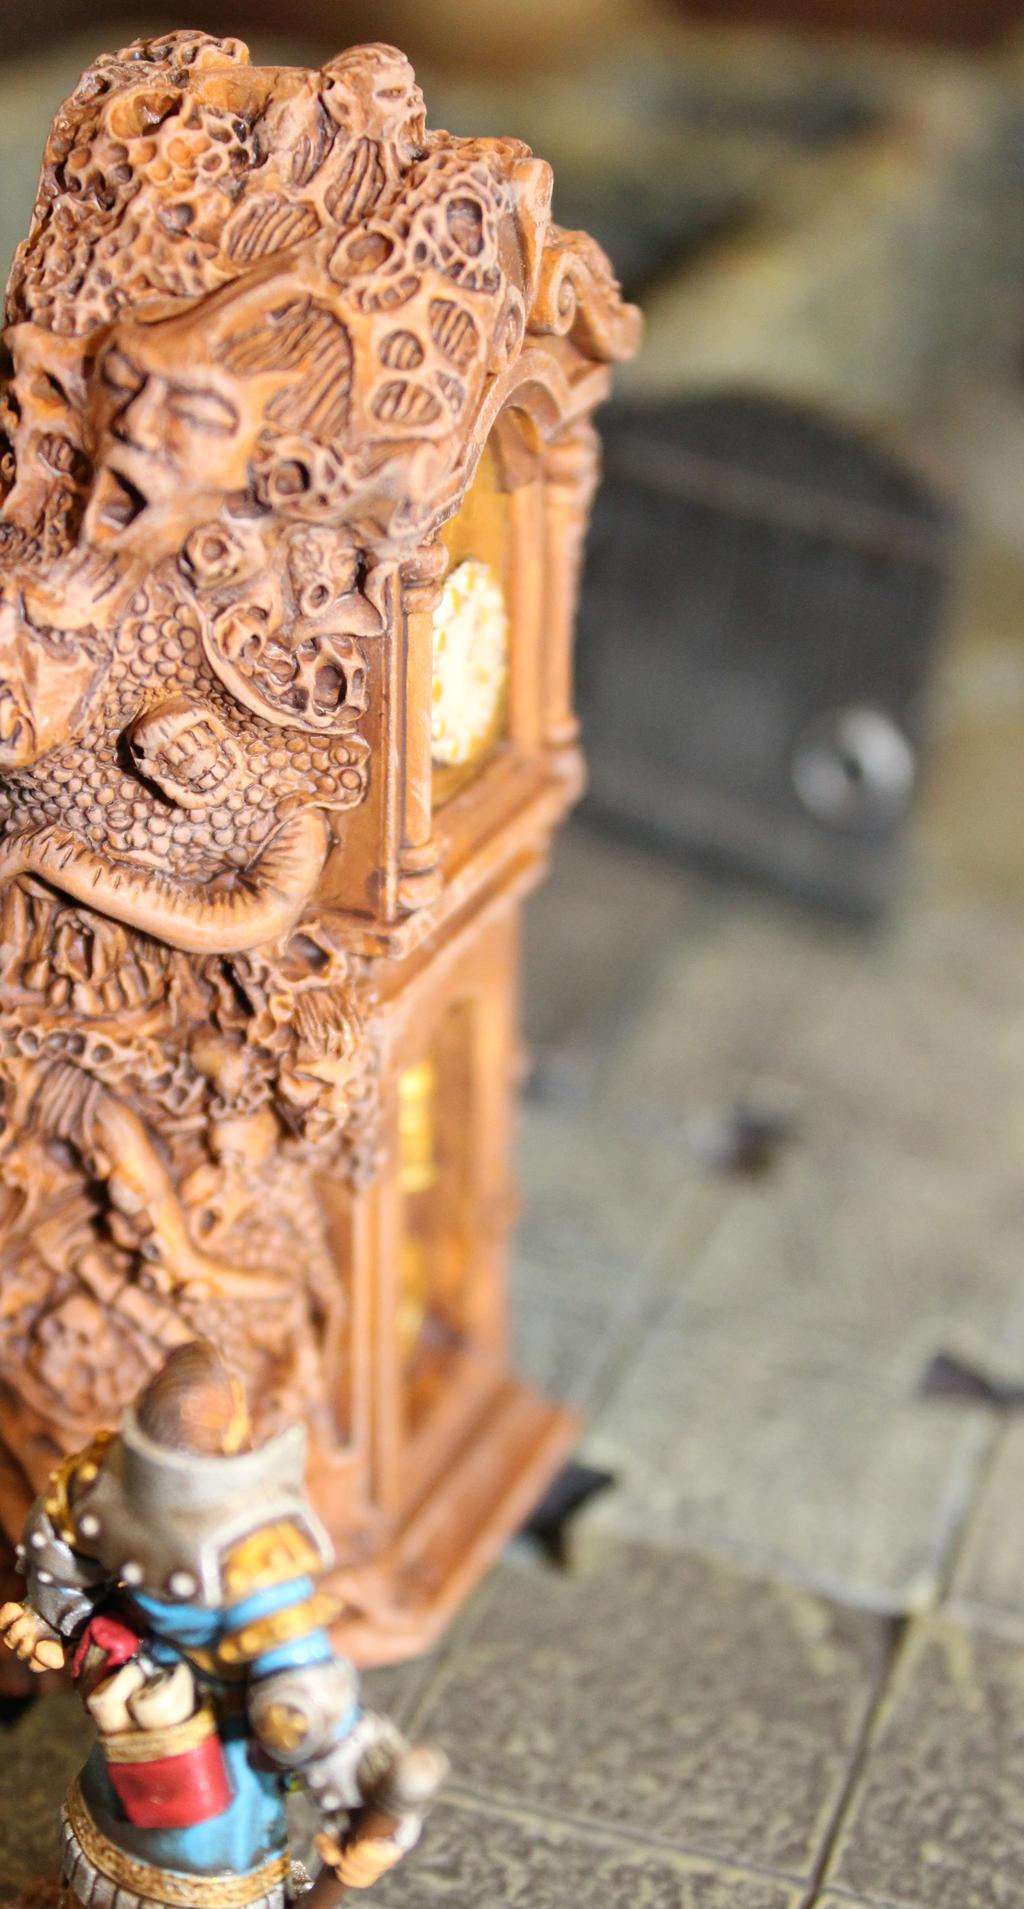 Demonic grandfather clock by MrVergee